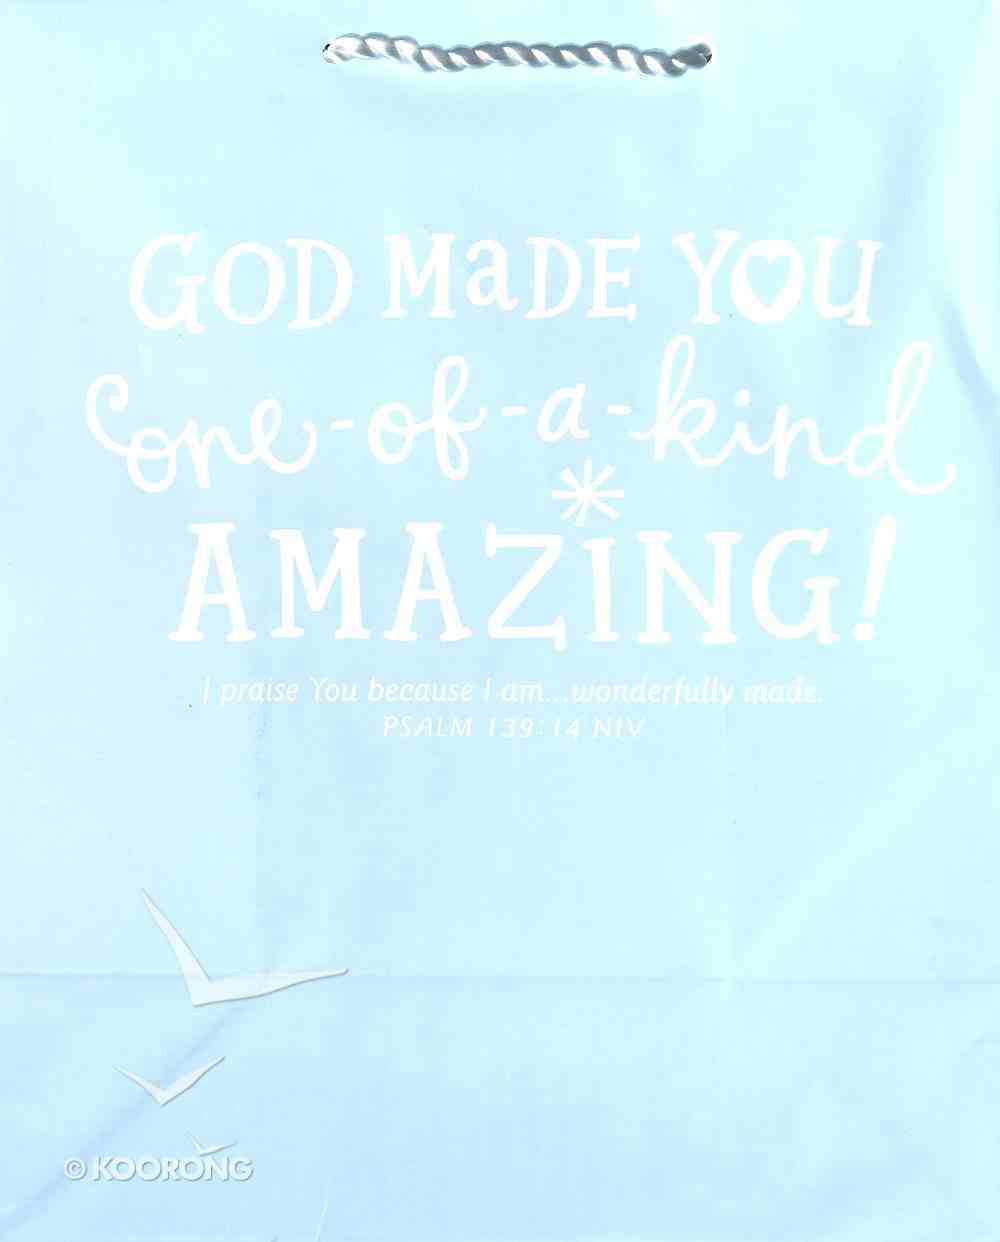 Value Gift Bag Large: Light Baby Blue (Psalm 139:14 Niv) Stationery